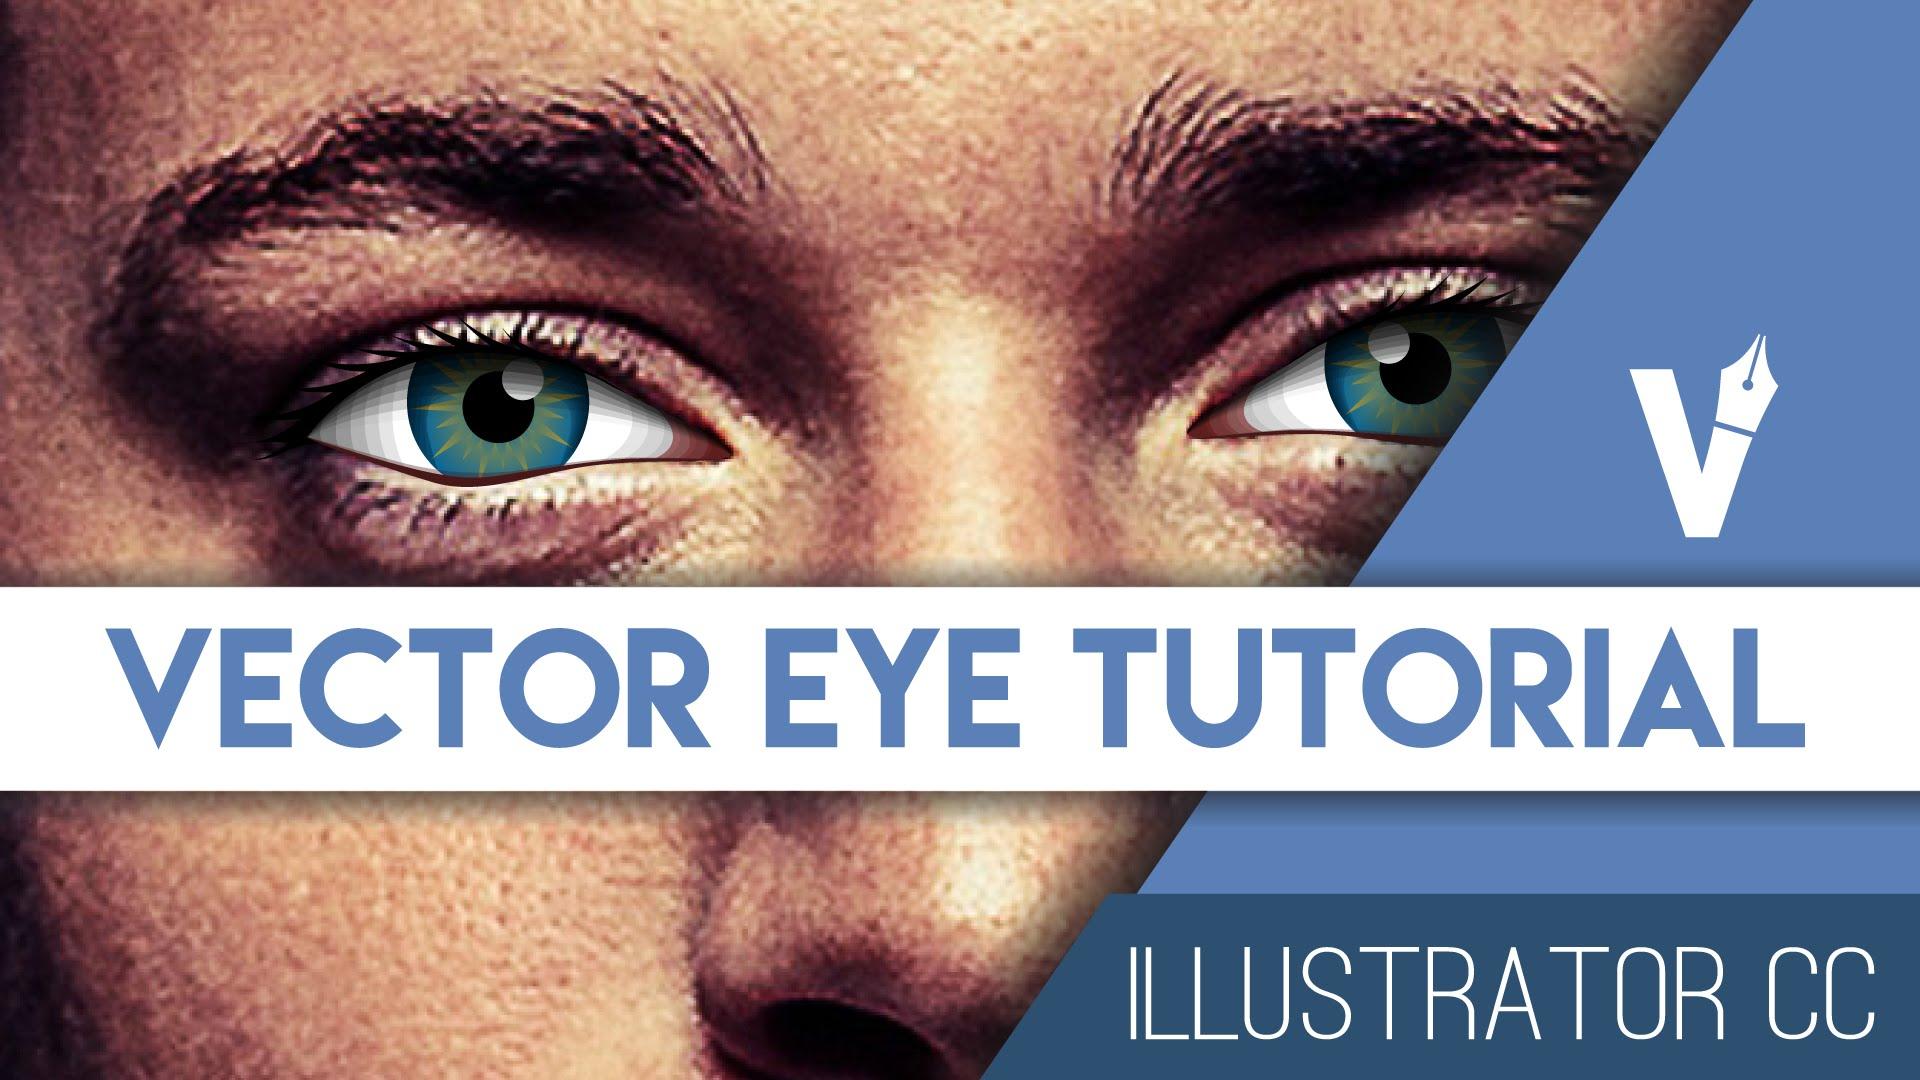 1920x1080 Realistic Vector Eye